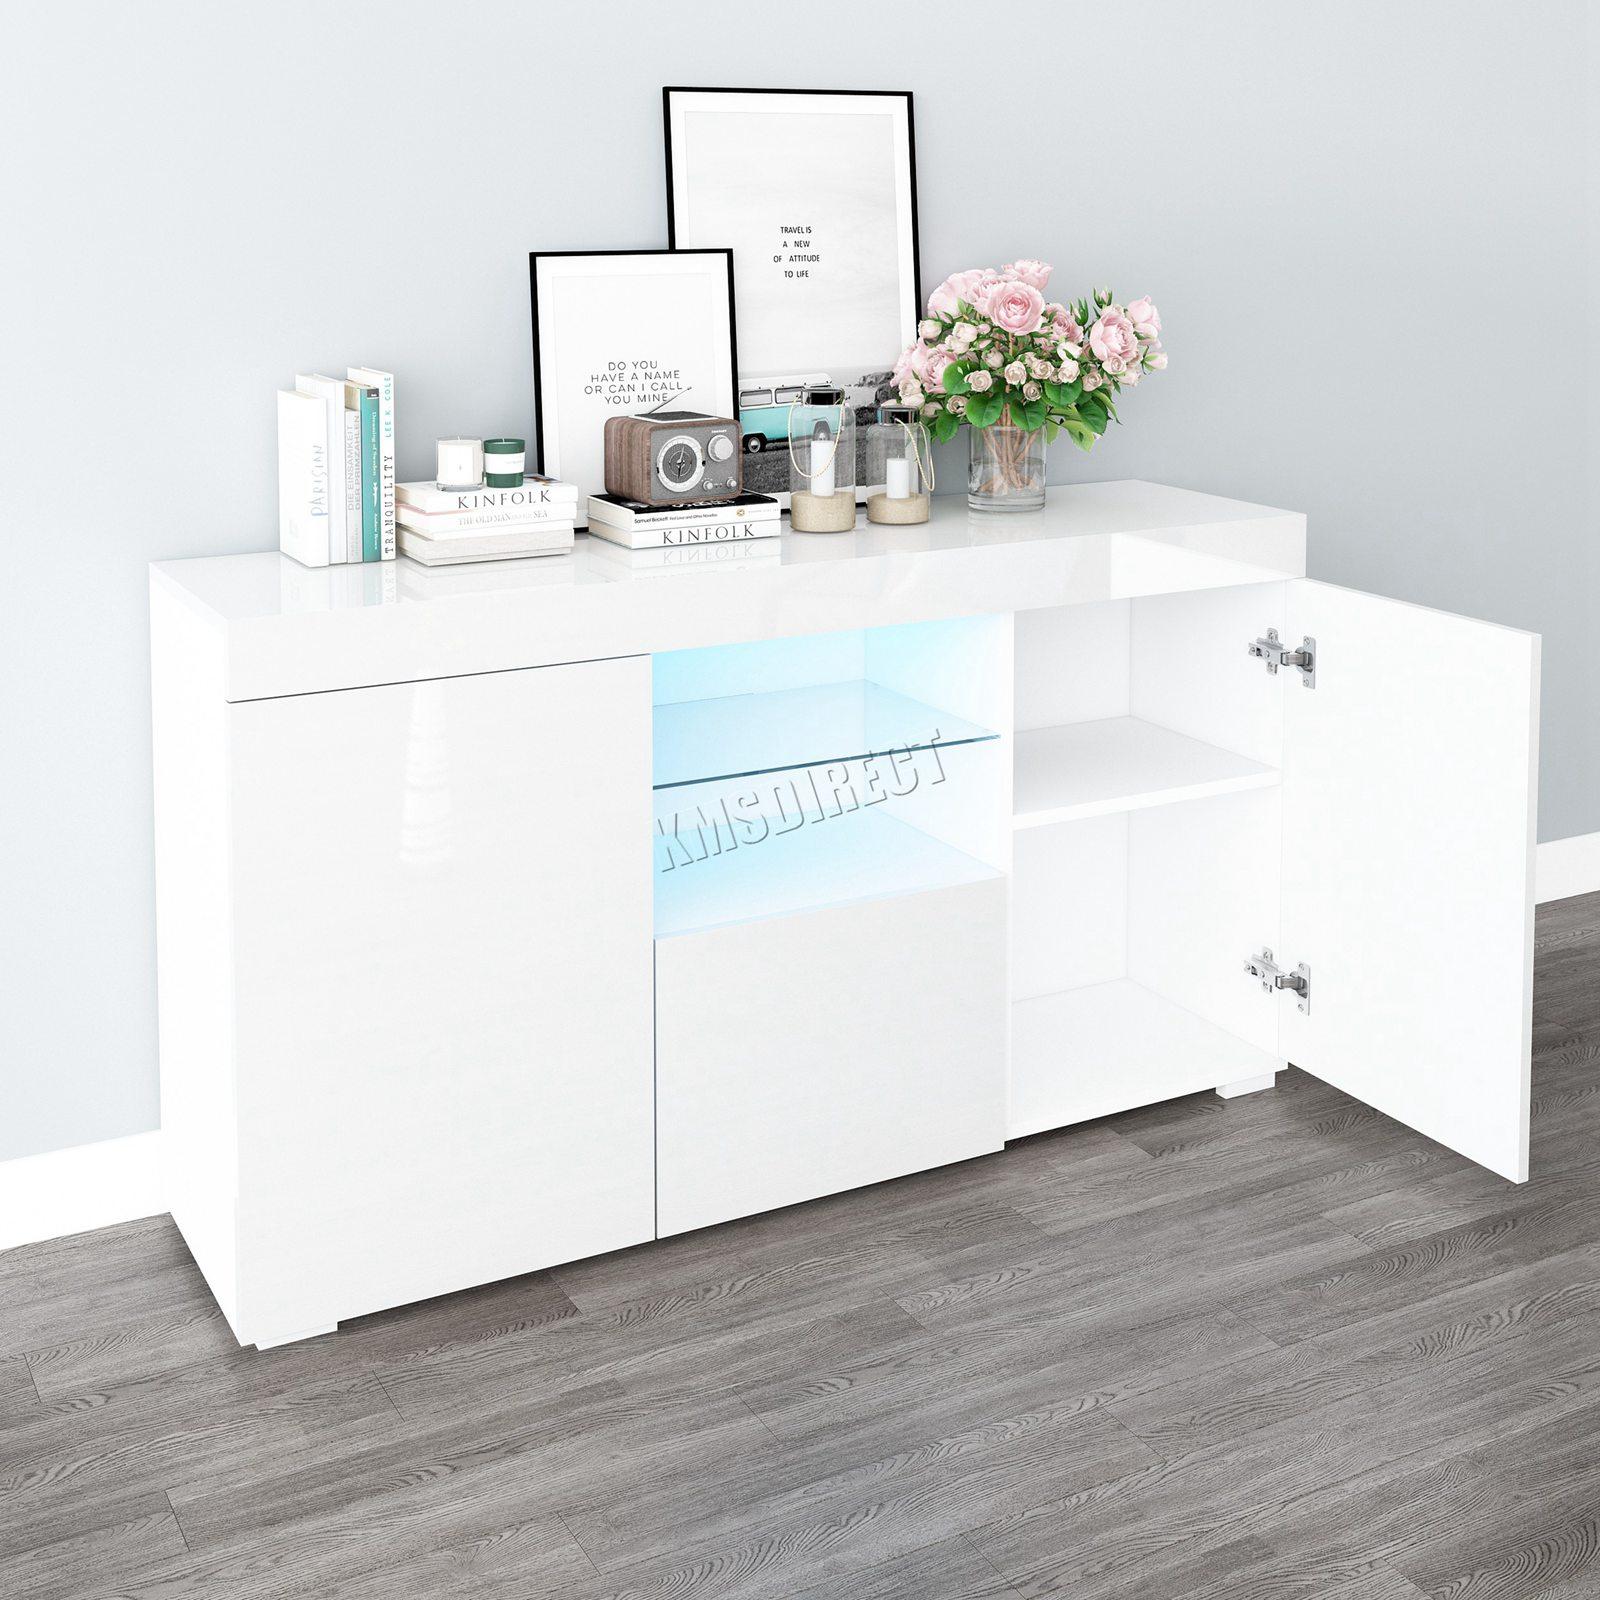 WestWood-PB-High-Gloss-Cabinet-LED-Bookshelf-Sideboard-Cupboard-Home-Unit-PHC03 thumbnail 31